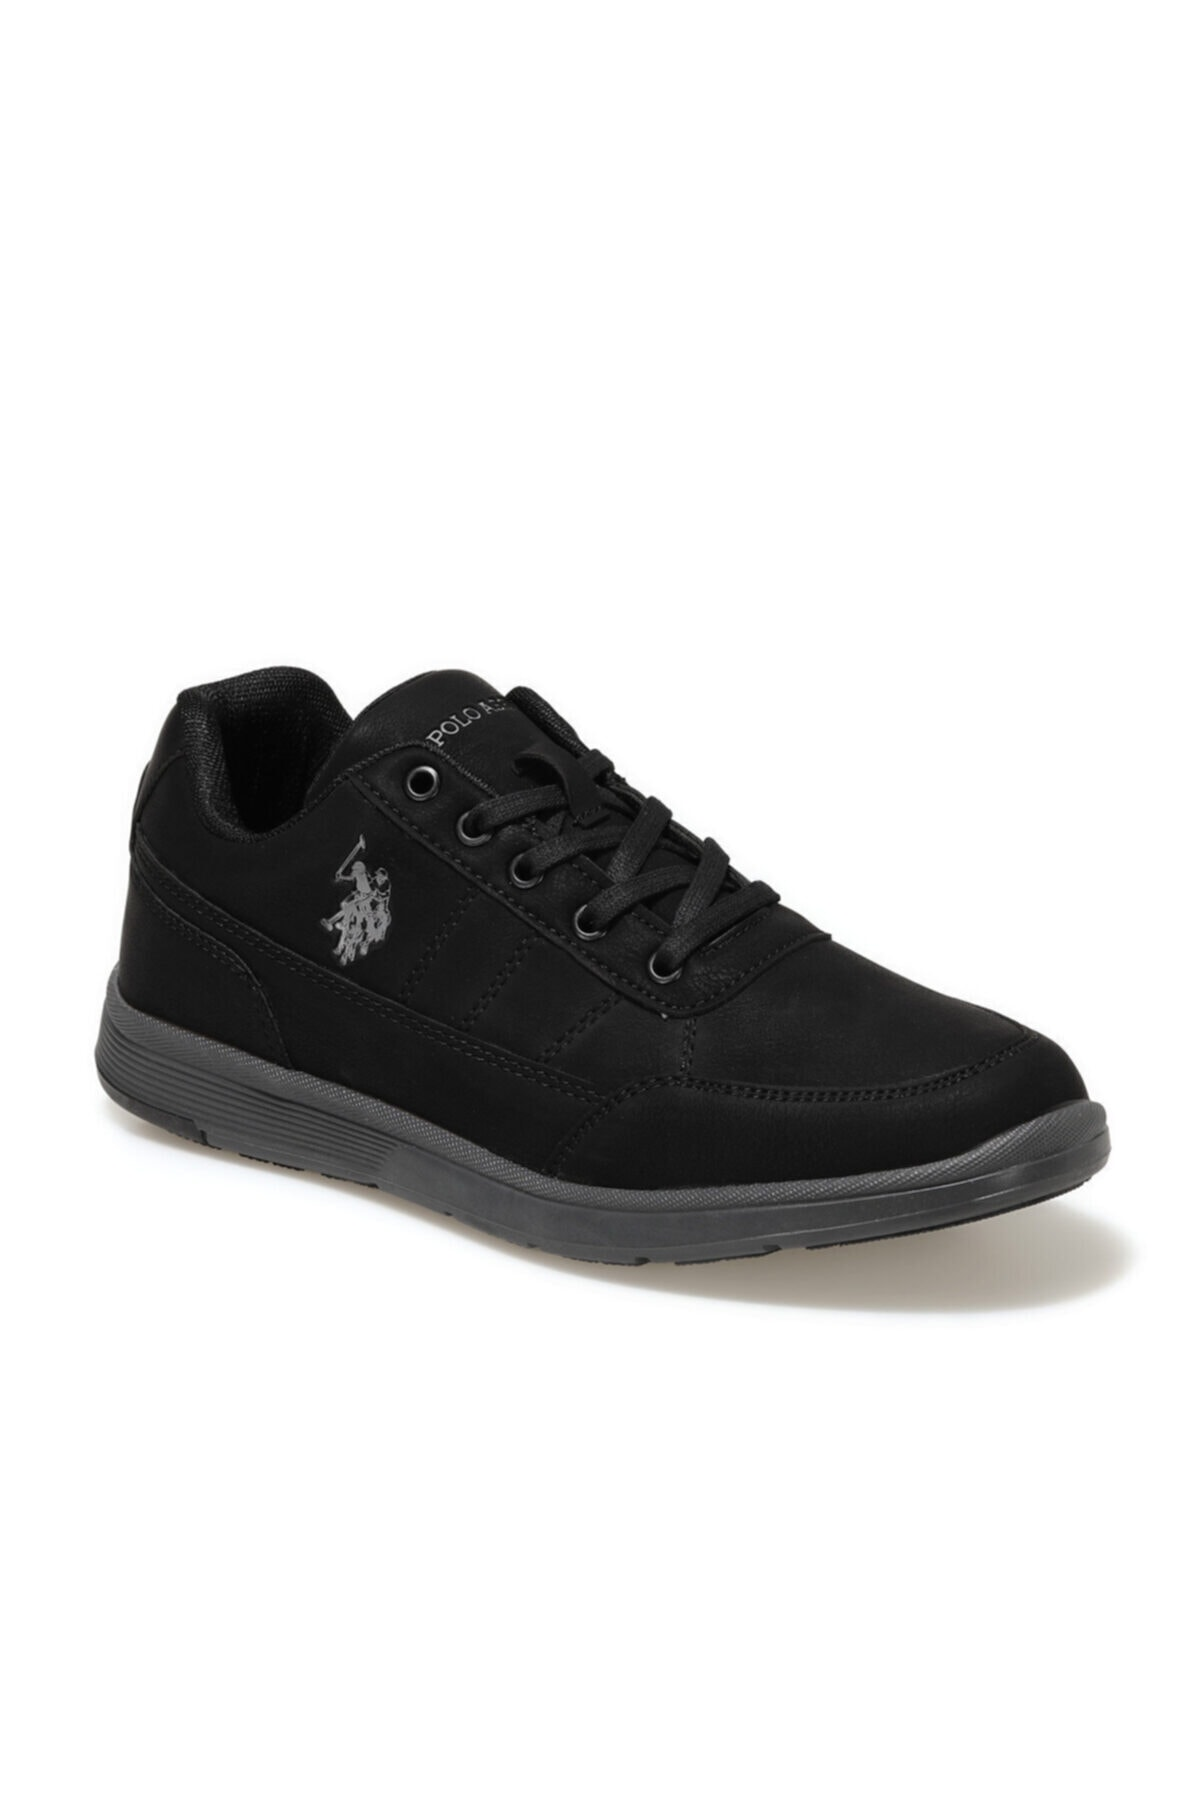 U.S. Polo Assn. LION Siyah Erkek Ayakkabı 100550085 1